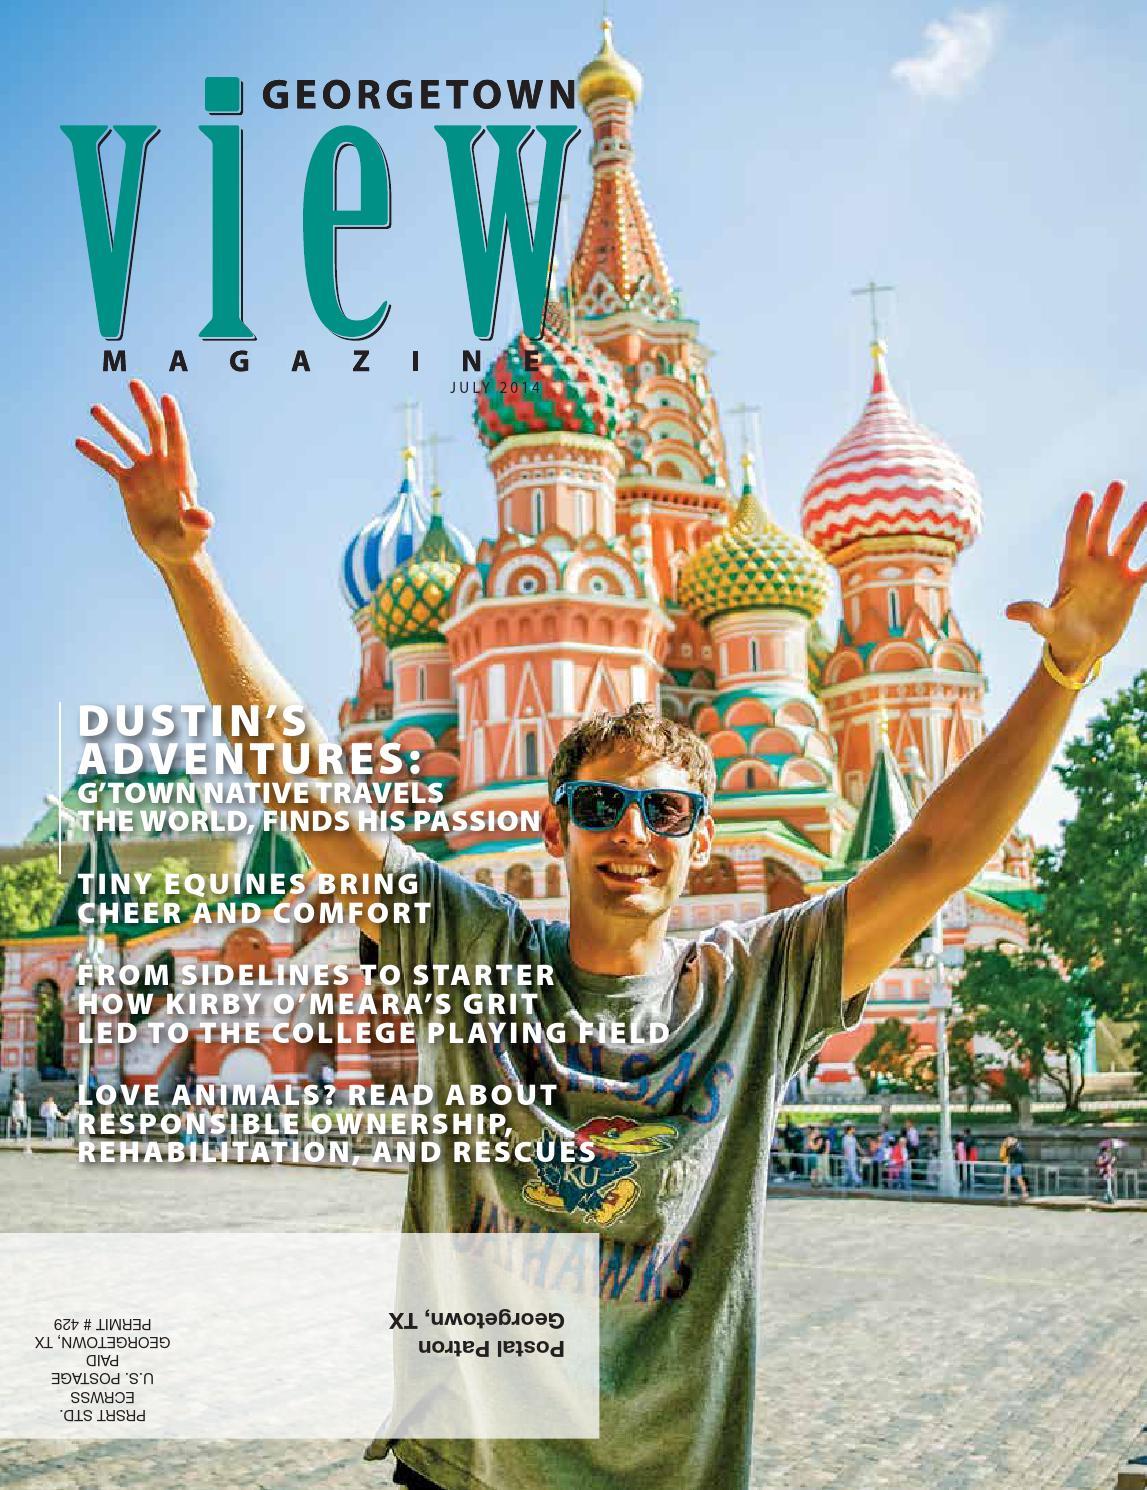 76e0cbf1e Georgetown View Magazine/ July 2014 by Georgetown View - issuu